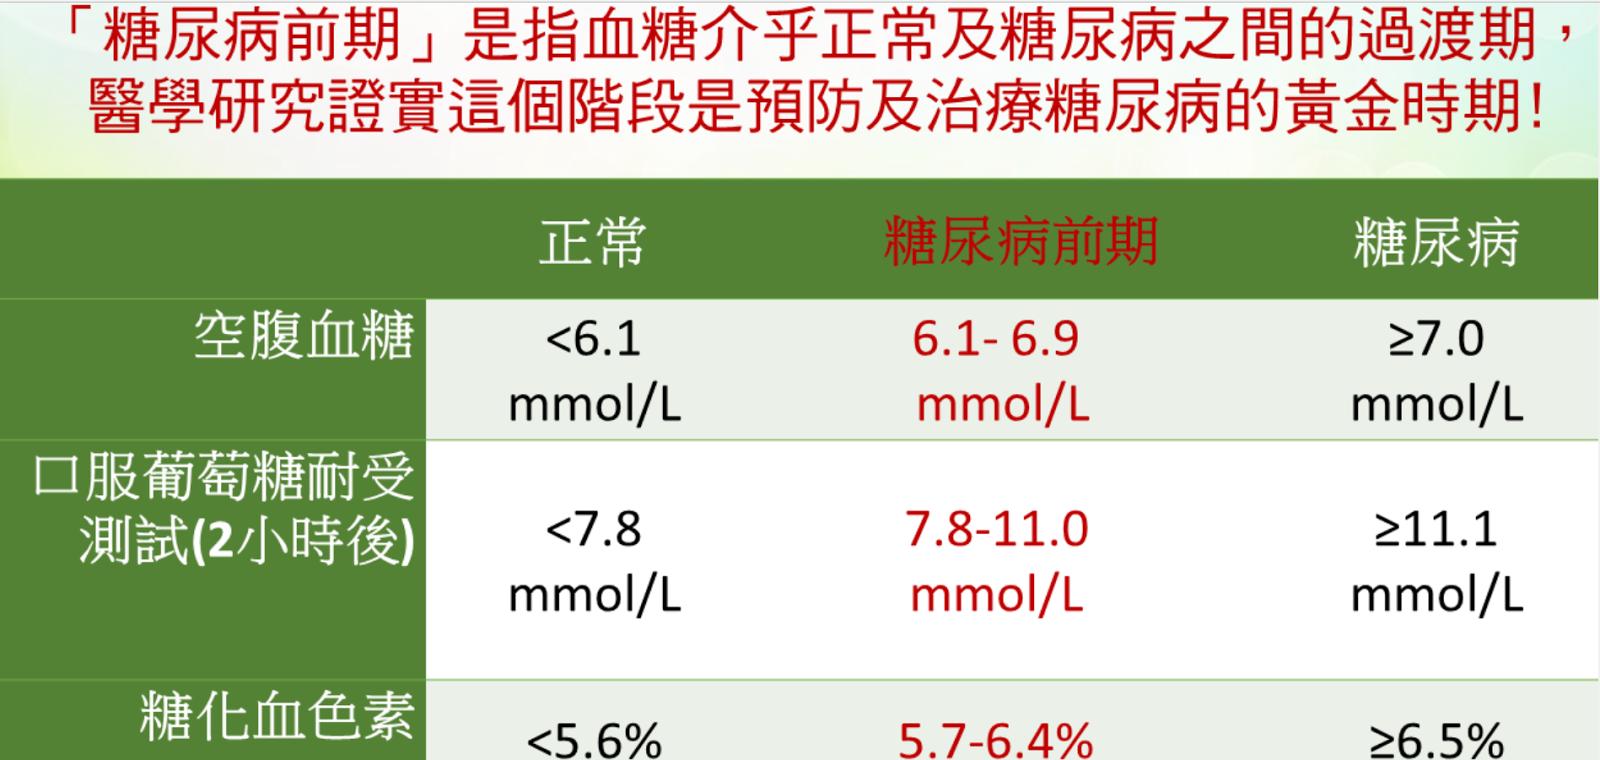 Kin Wing: 轉貼文章 ~ 血糖檢驗「空腹」幾小時最準確?可以喝水嗎?